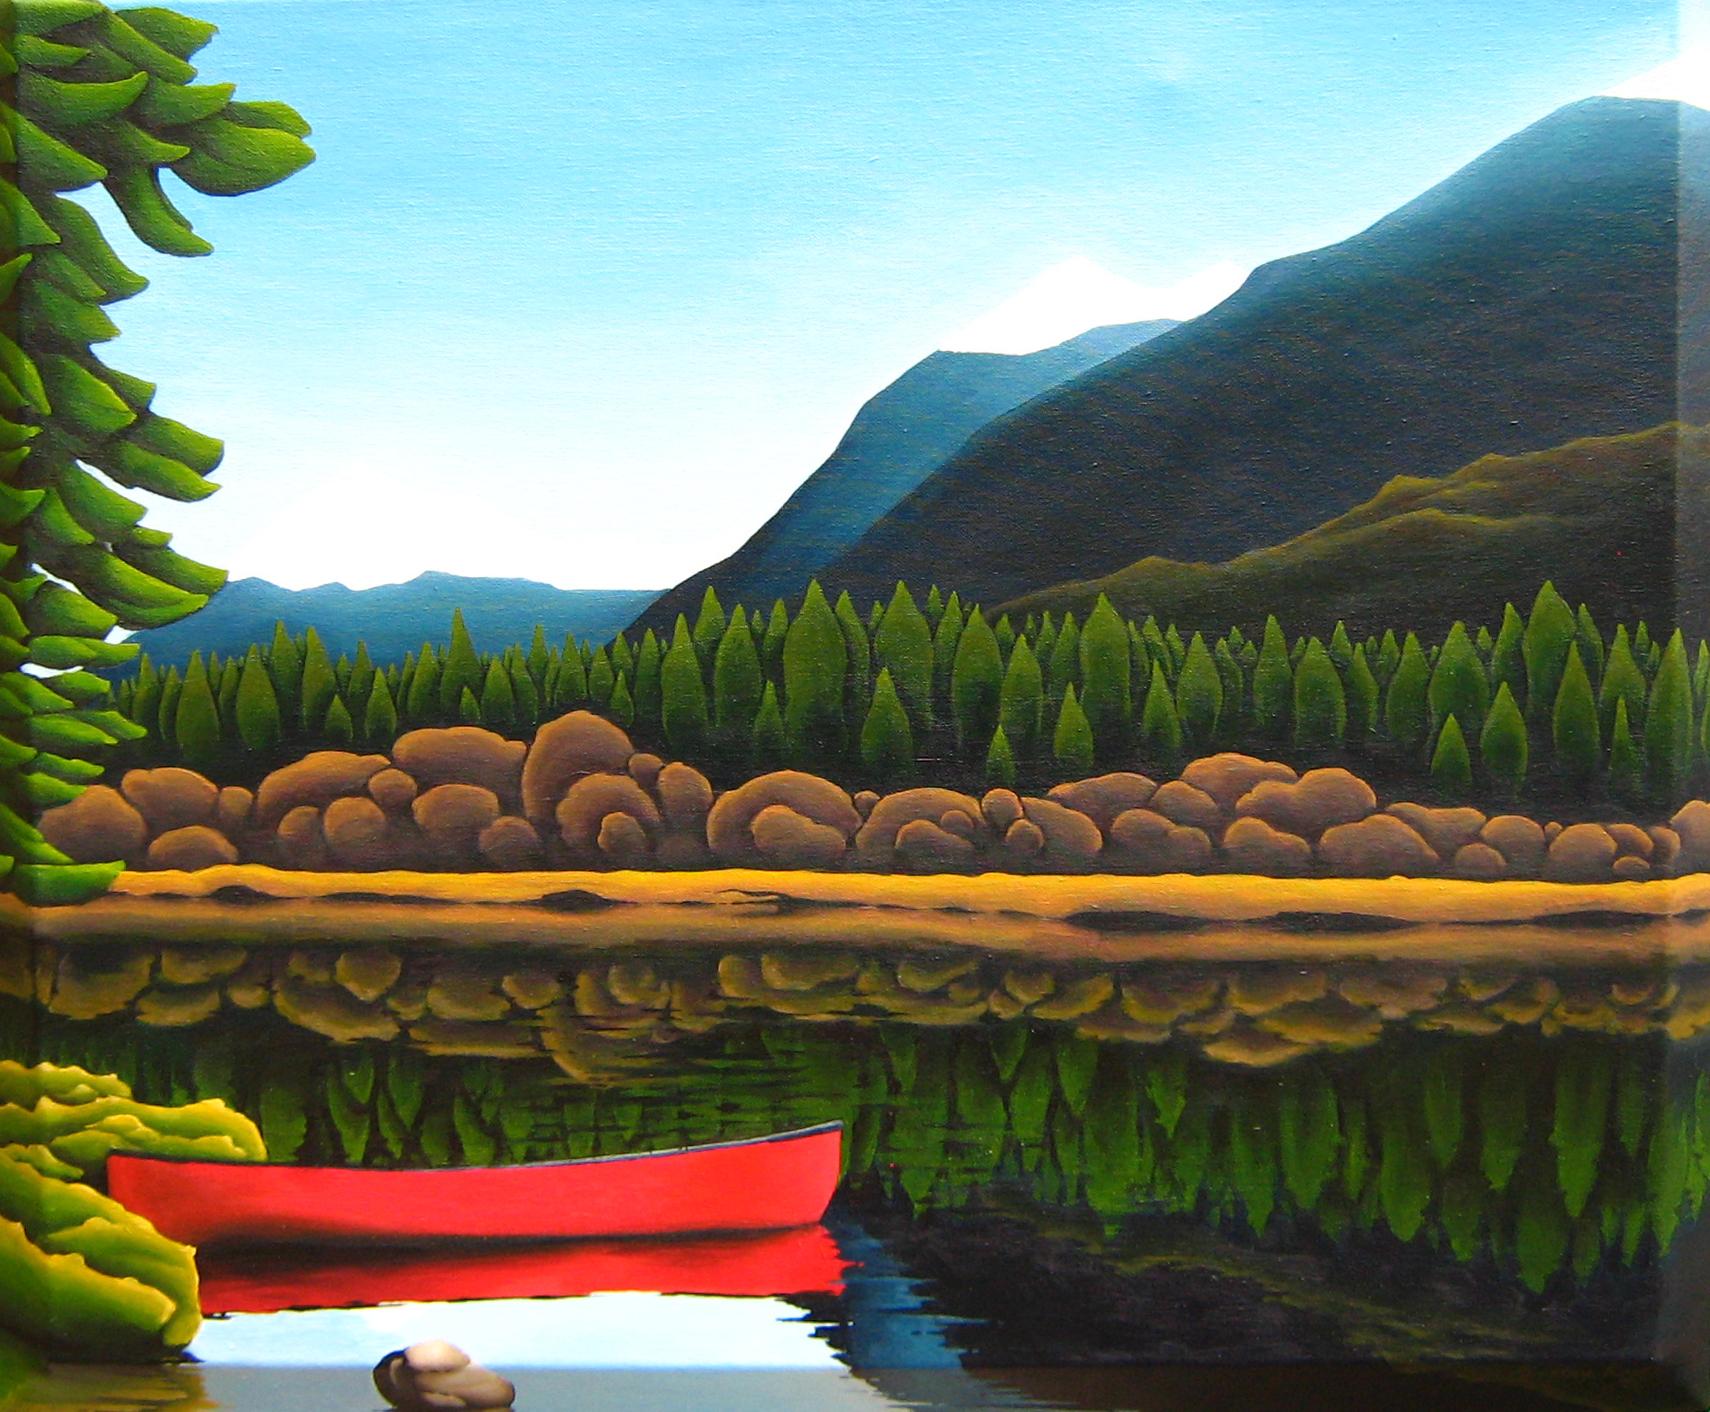 Bowron Lakes, Red Canoe, Mountains